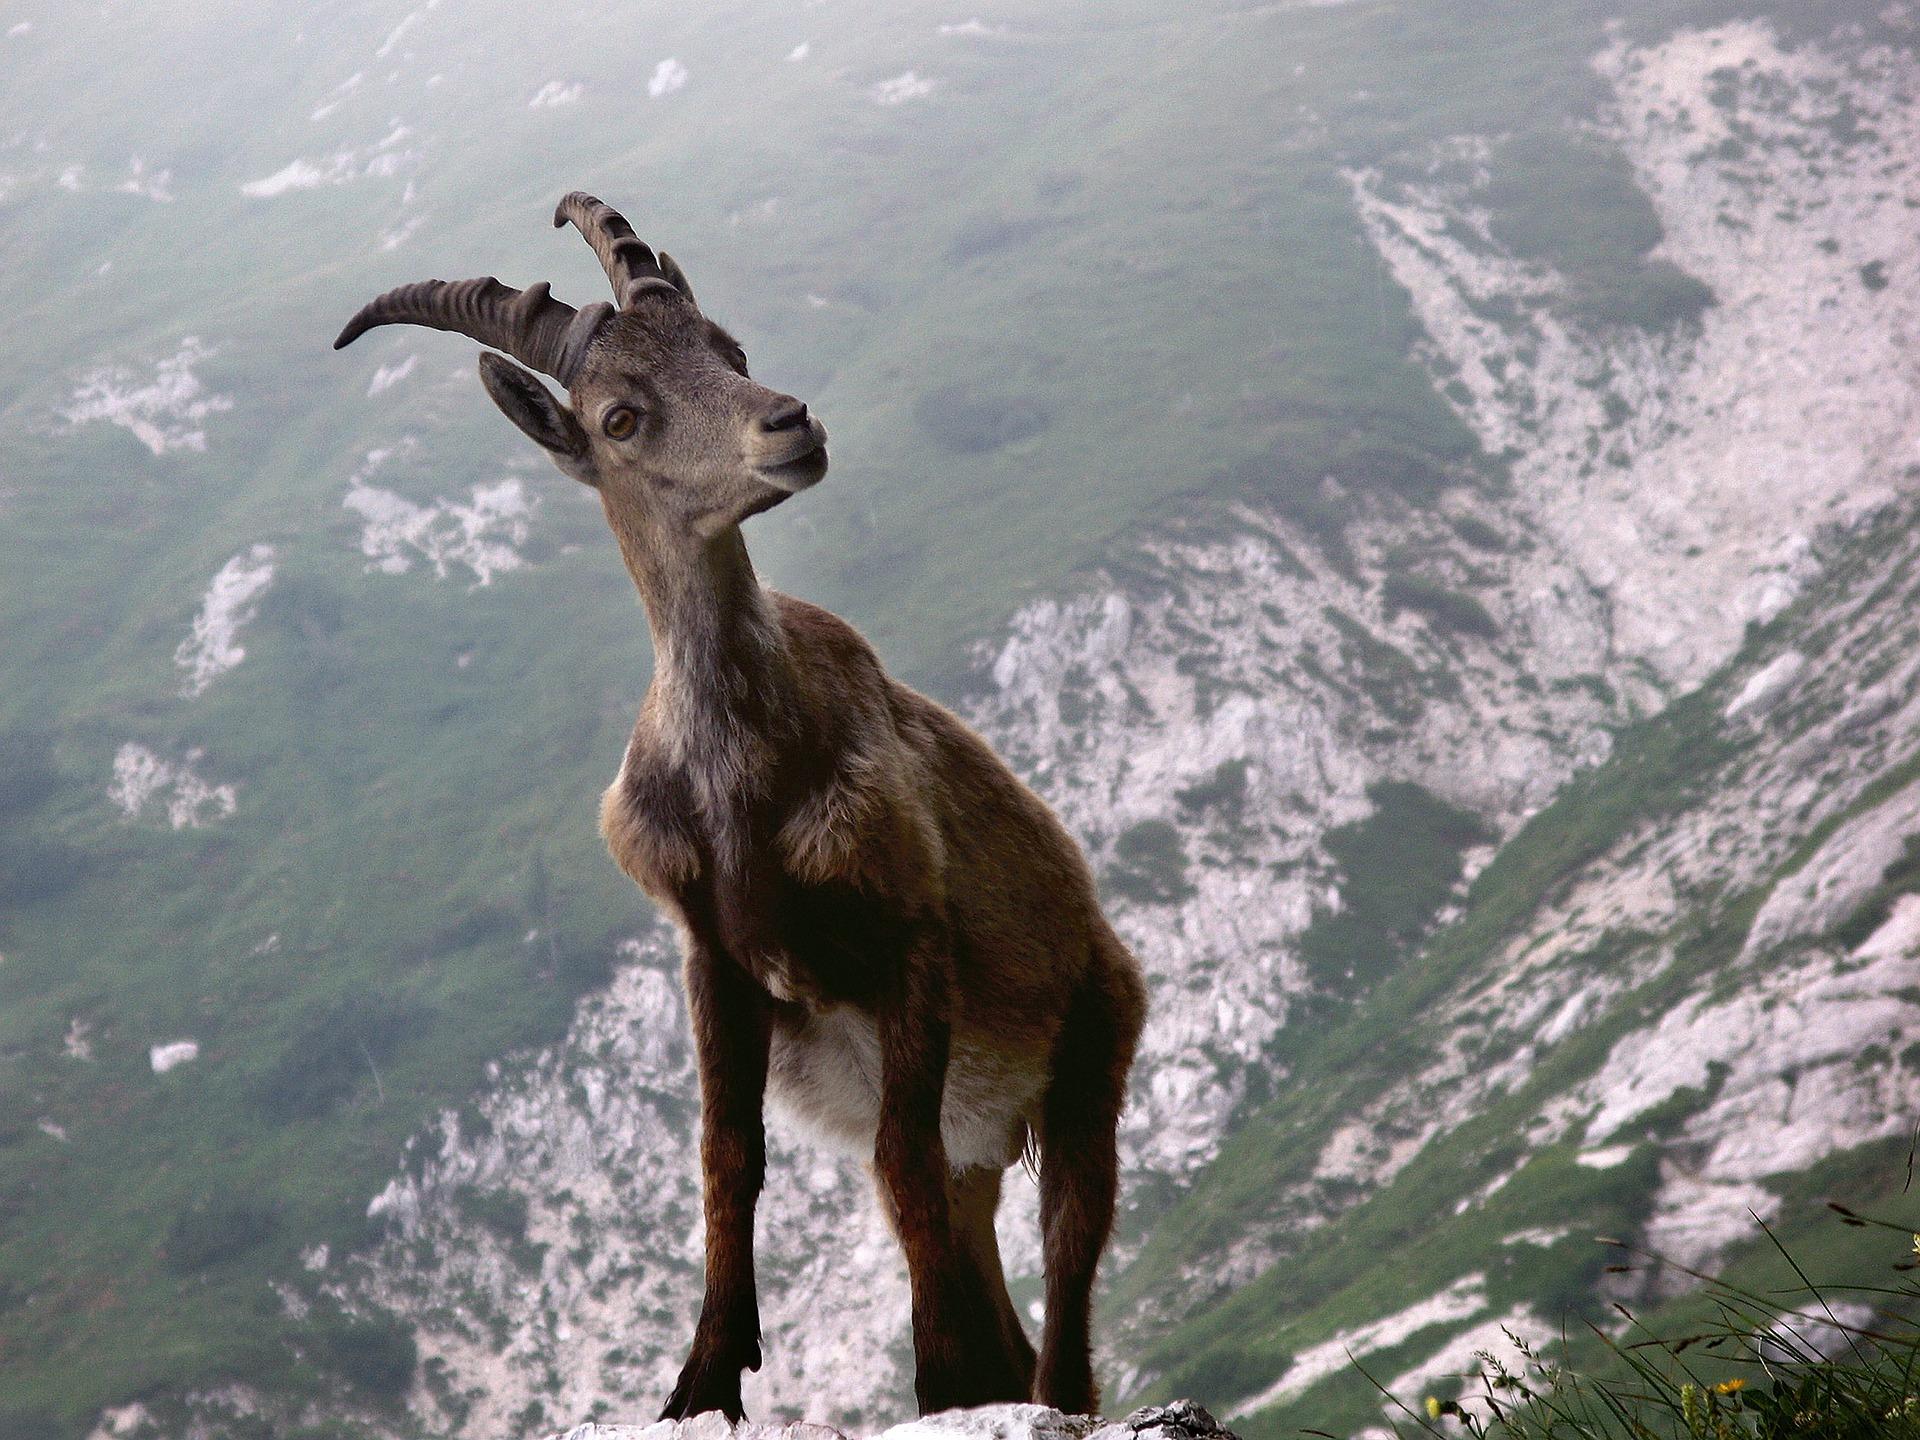 Goat c sAlesa with Pixabay.jpg